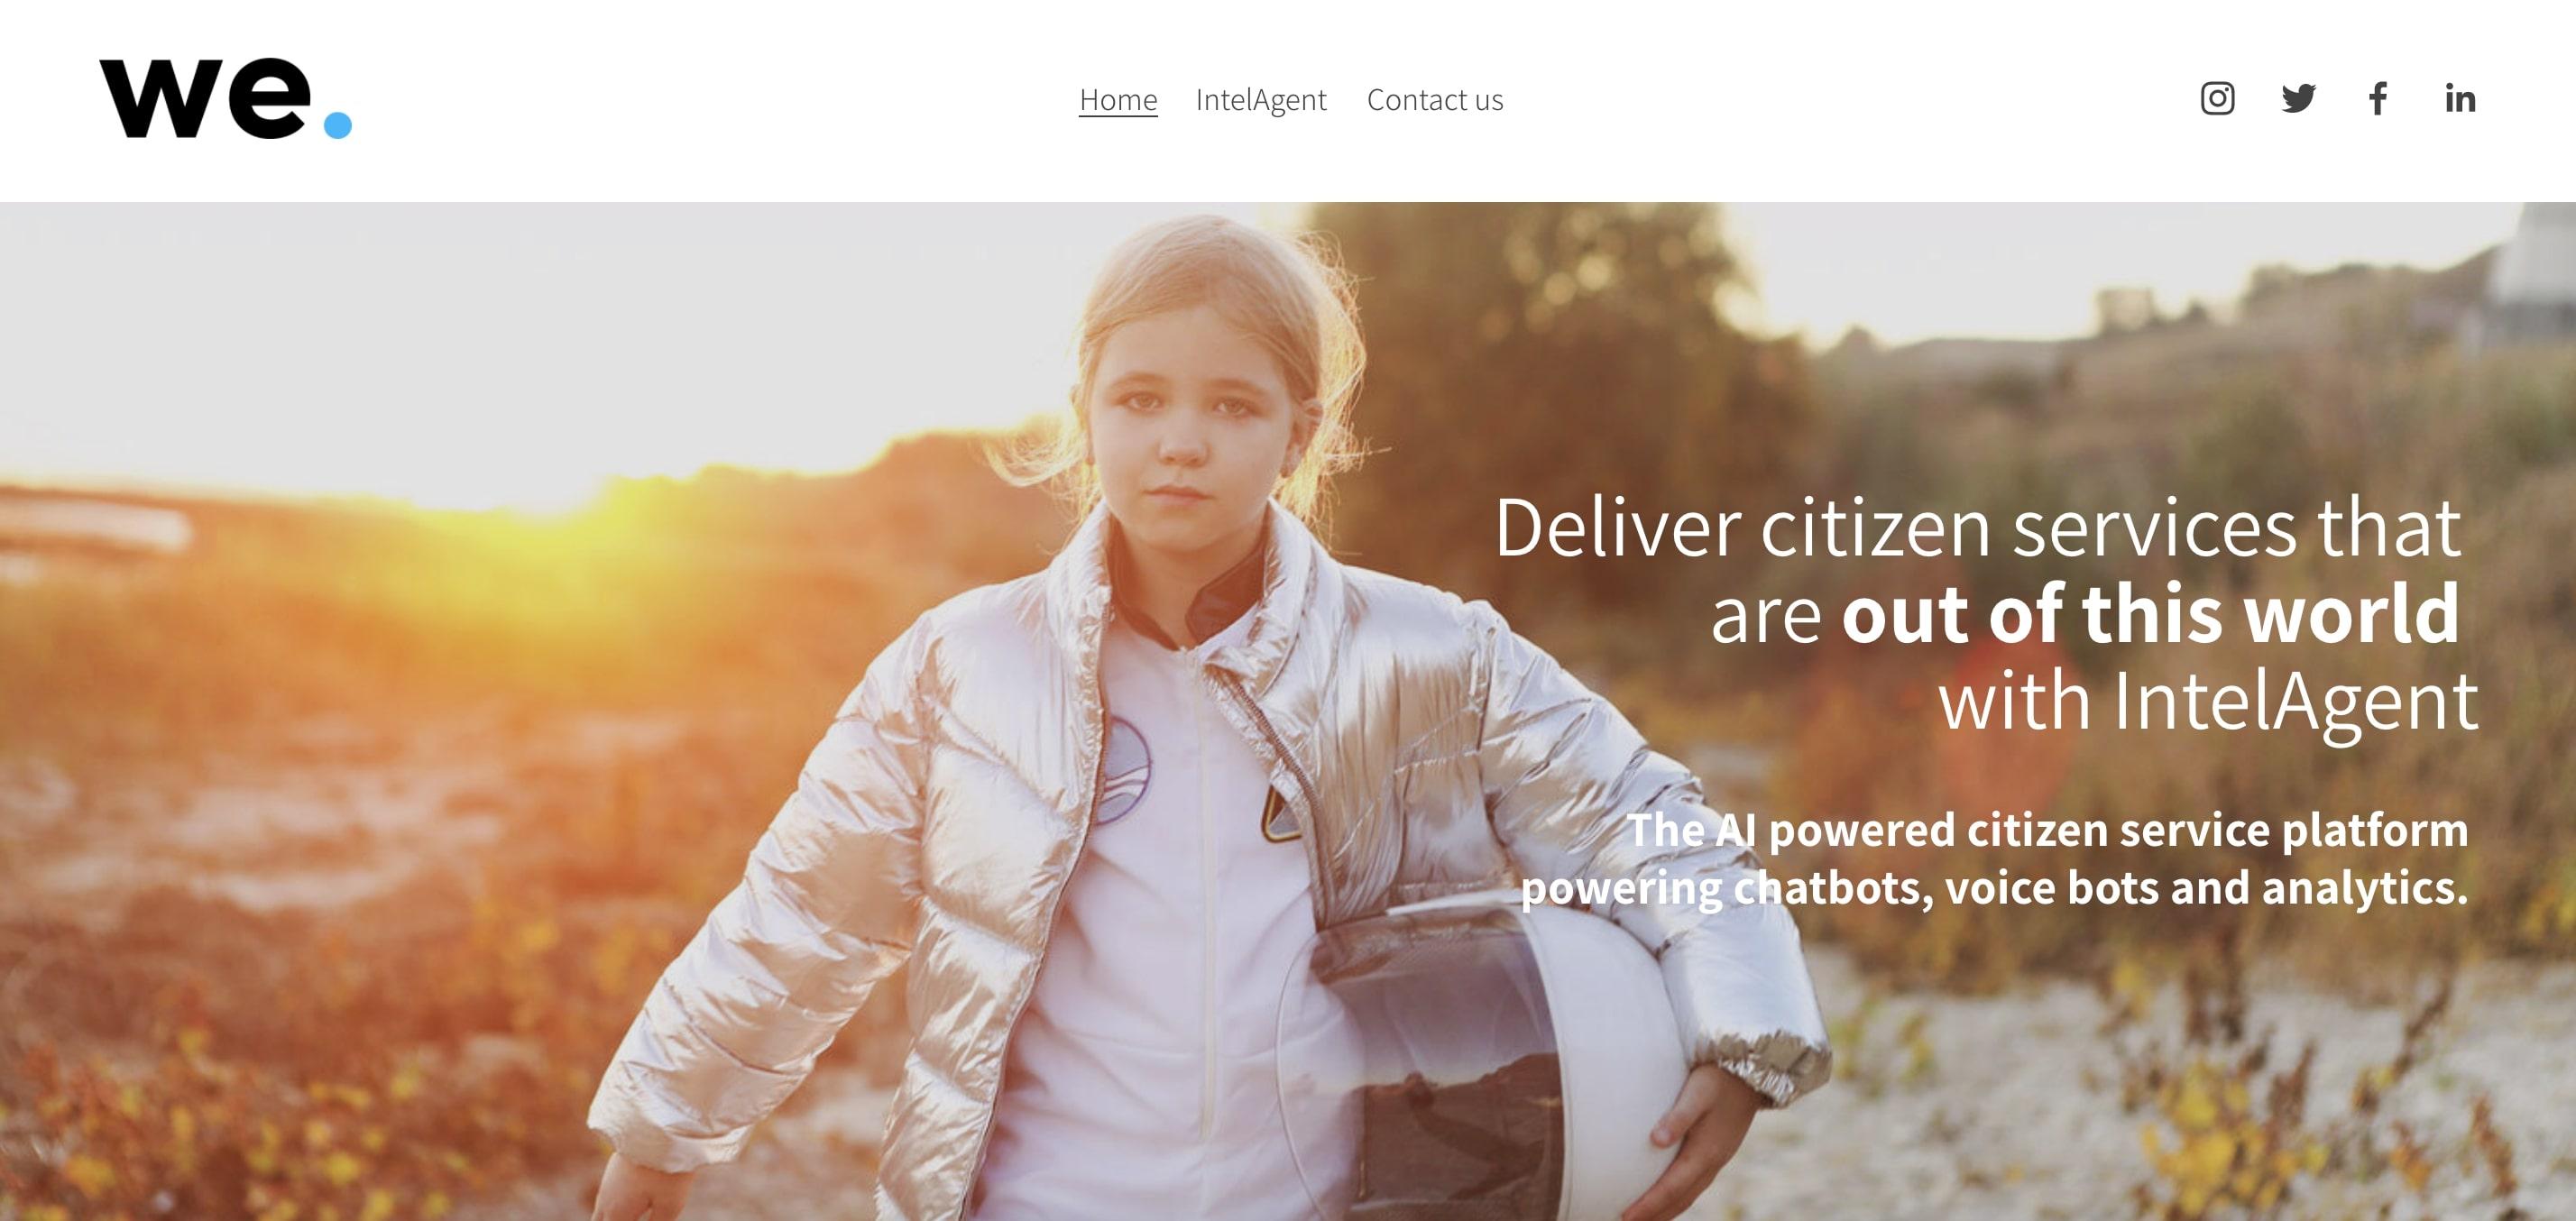 We Build Bots AI company website homepage